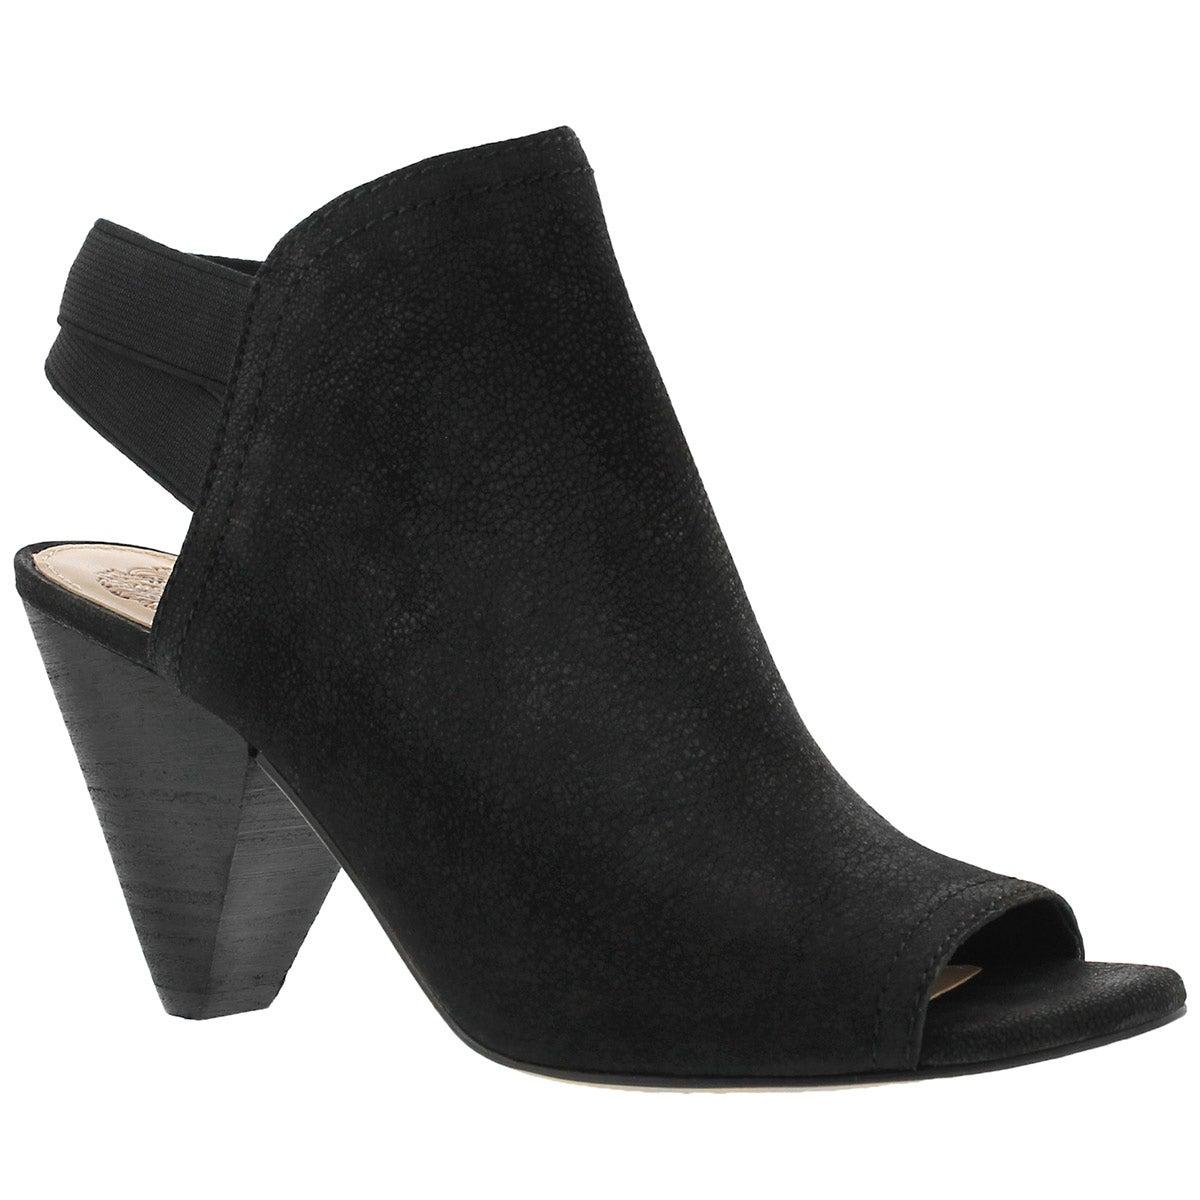 Womne's EDORA black peep toe dress sandals